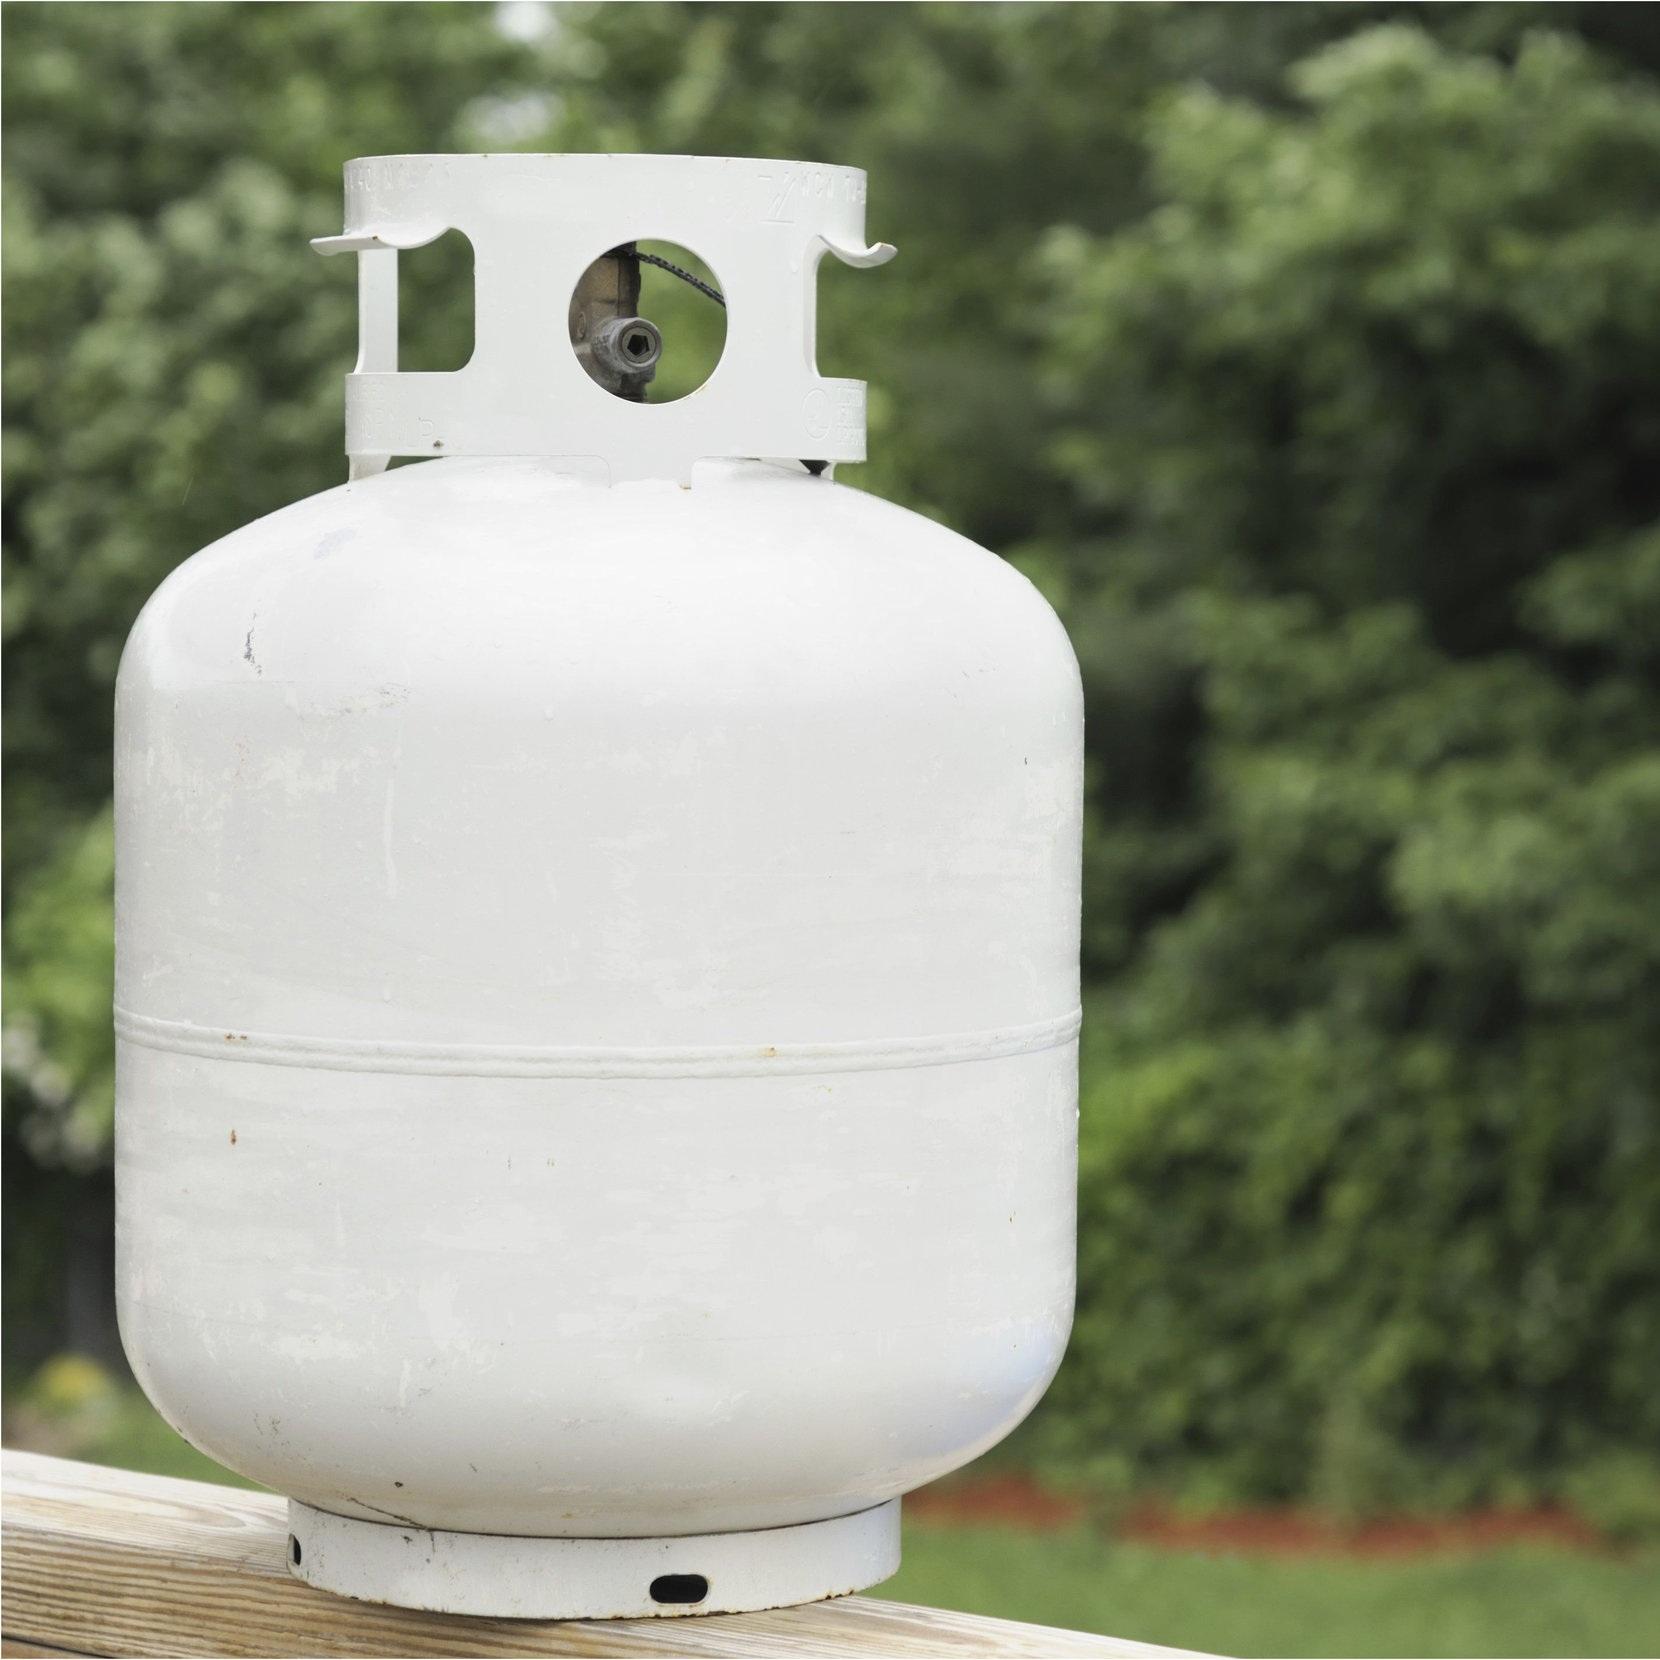 E.H. Wolf & Sons, Inc. fills propane tanks